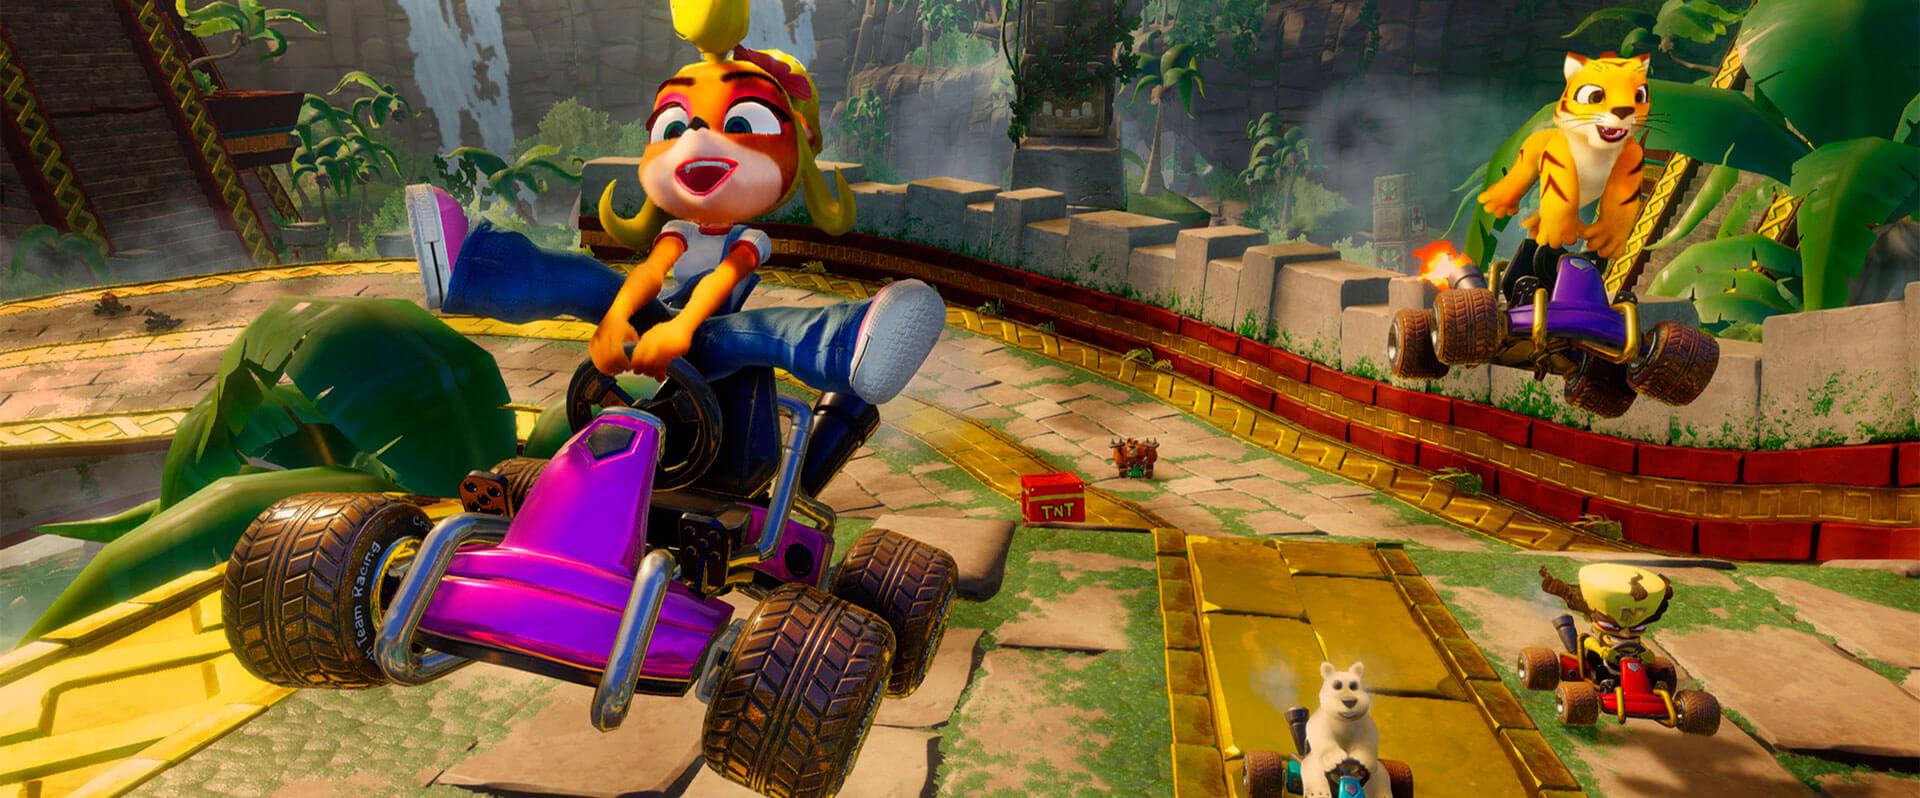 Crash Team Racing Nitro Fueled Análisis Texto 4